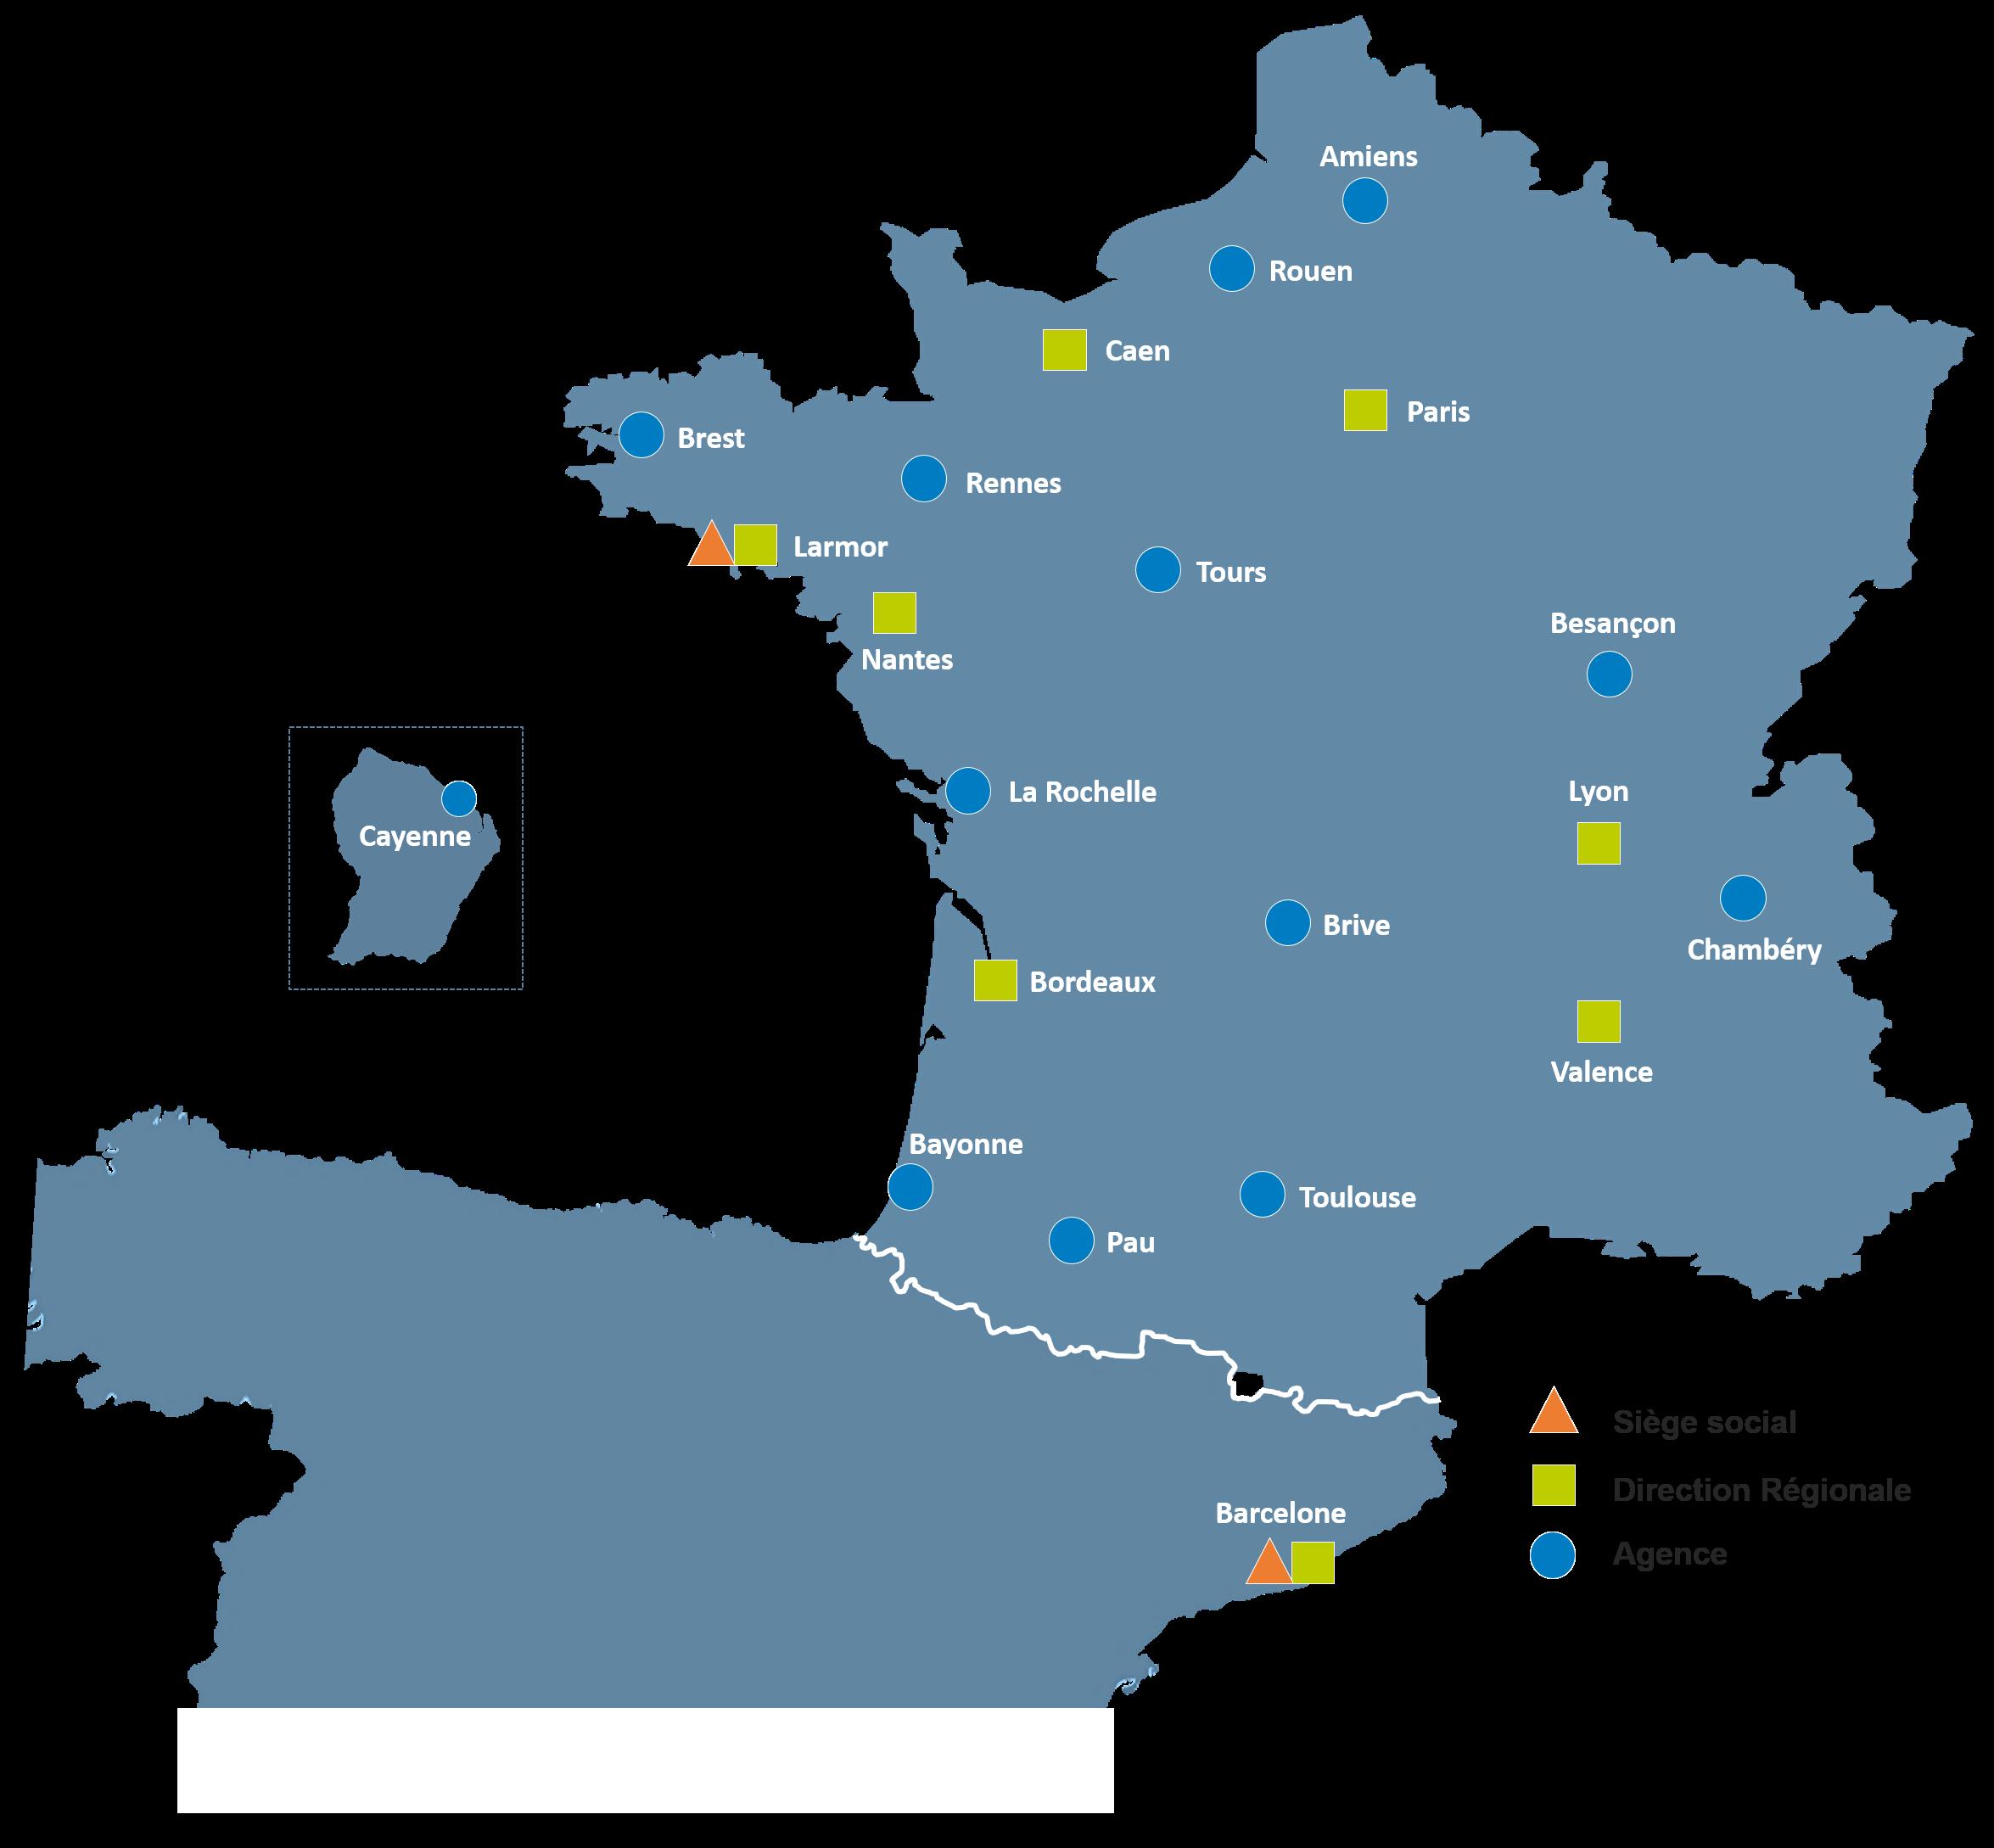 Carte des agences version FR